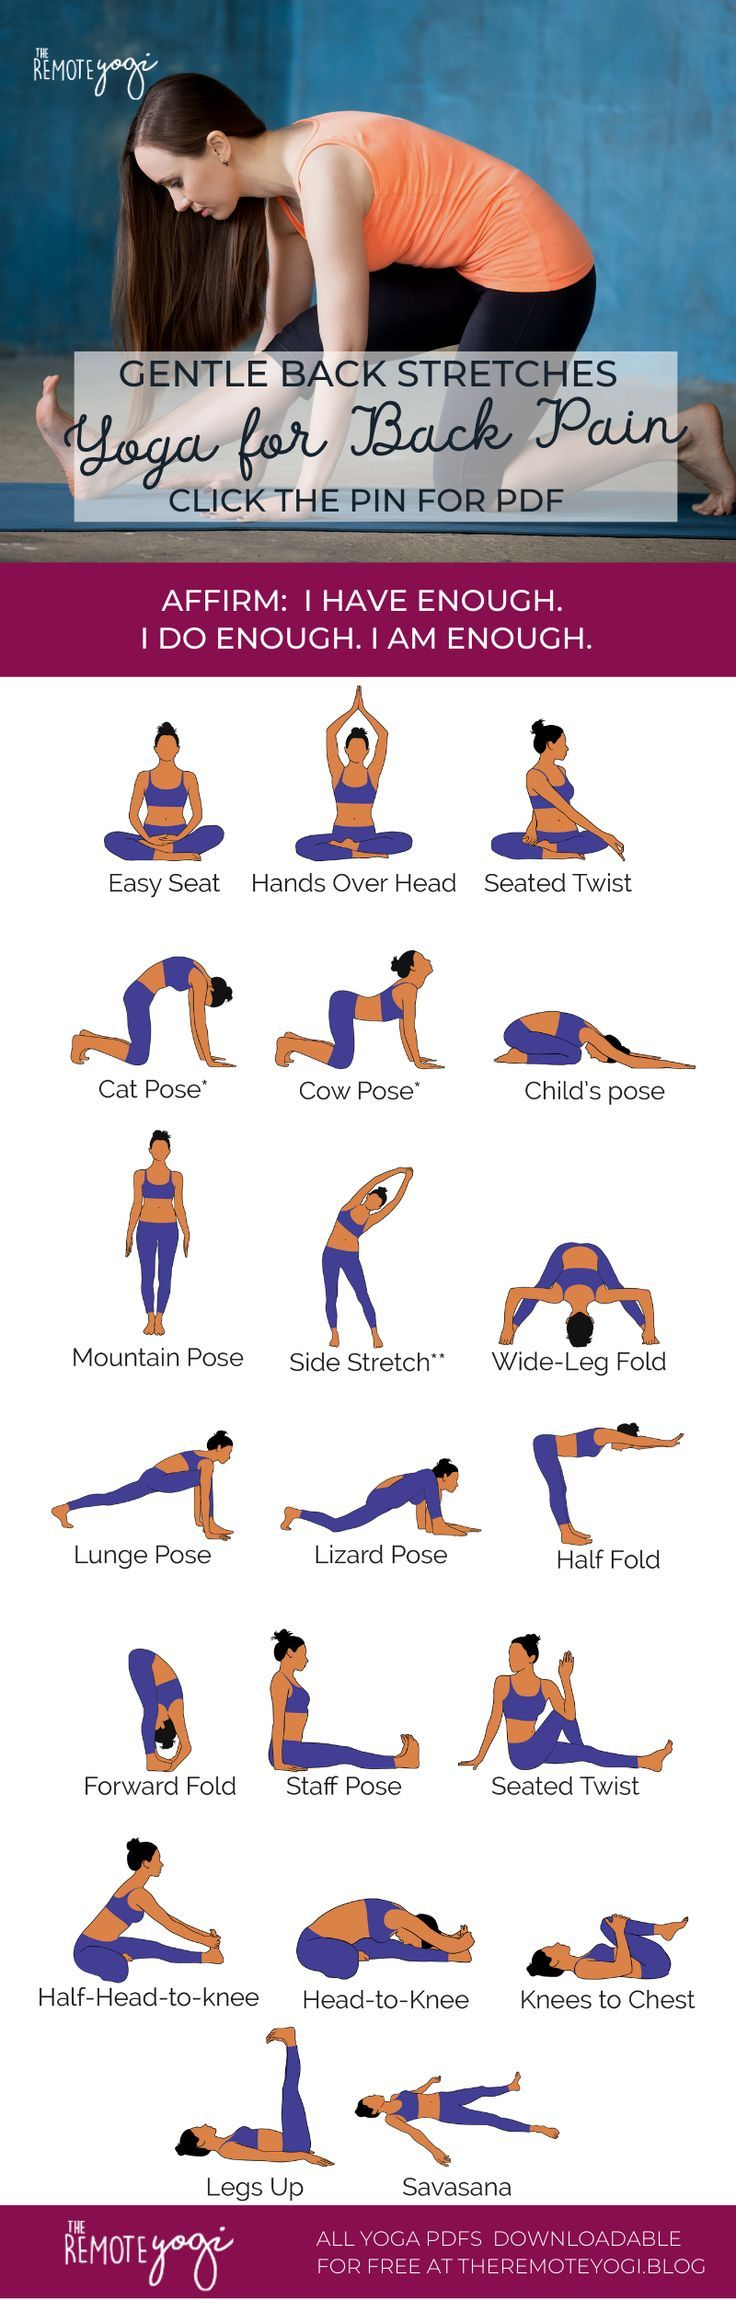 18+ Yoga poses printable pdf ideas